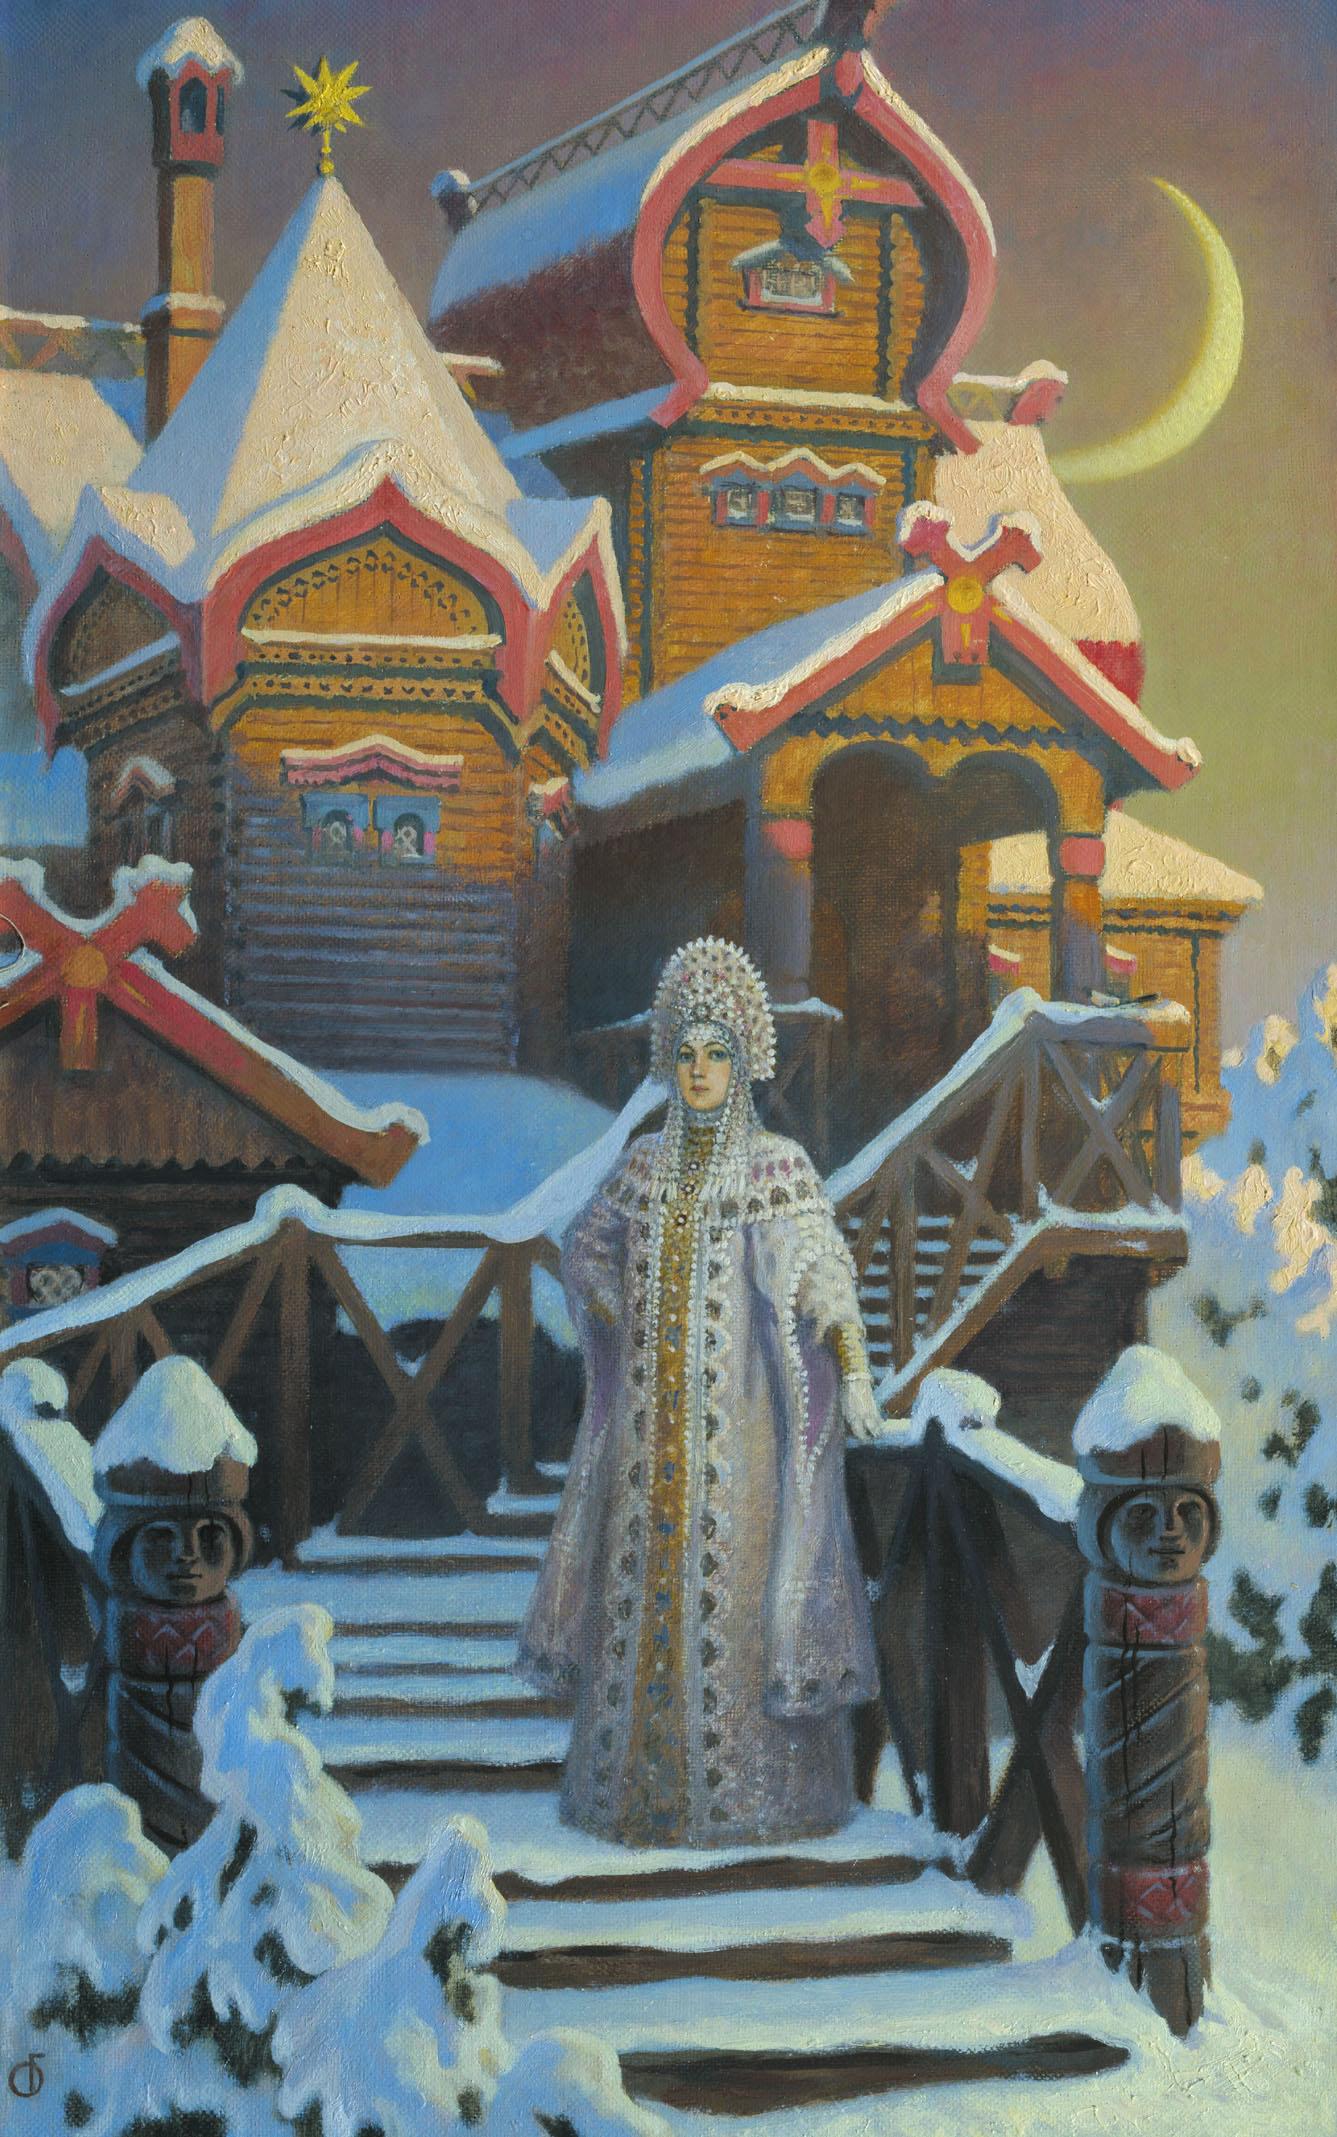 Терем царевны зимы. 2004